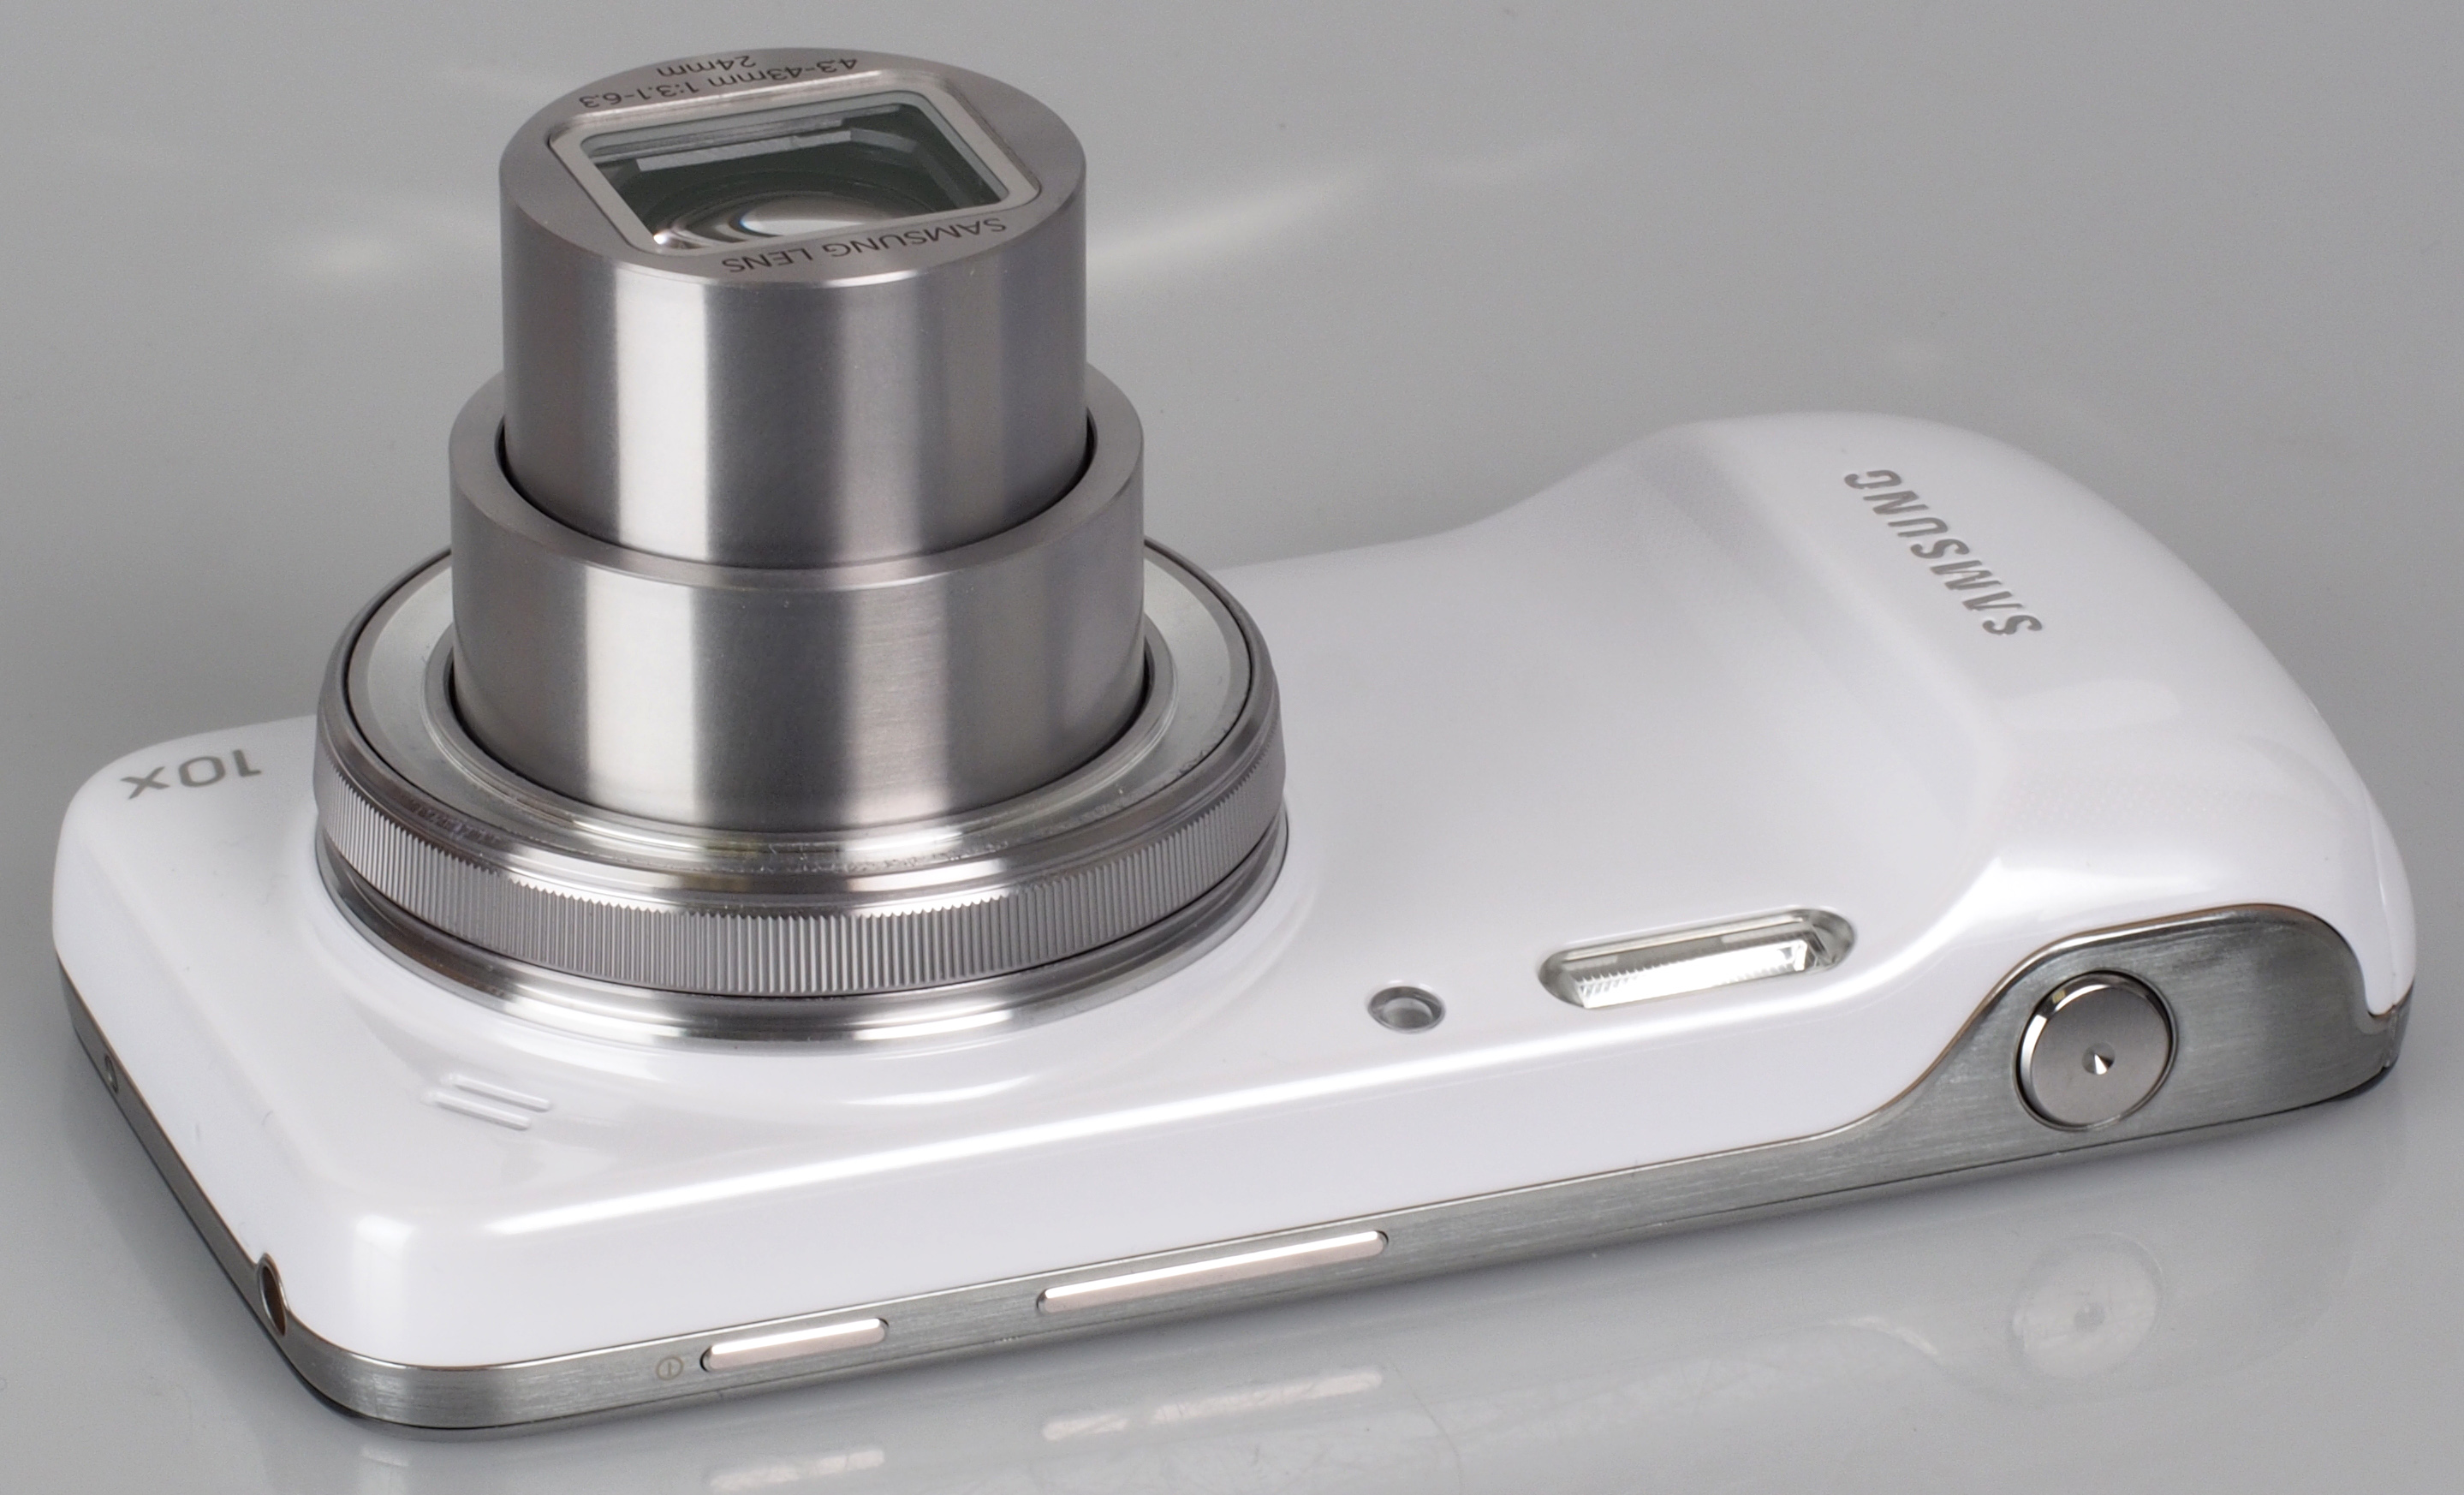 Շուտով կթողարկվի Samsung Galaxy S5 Zoom